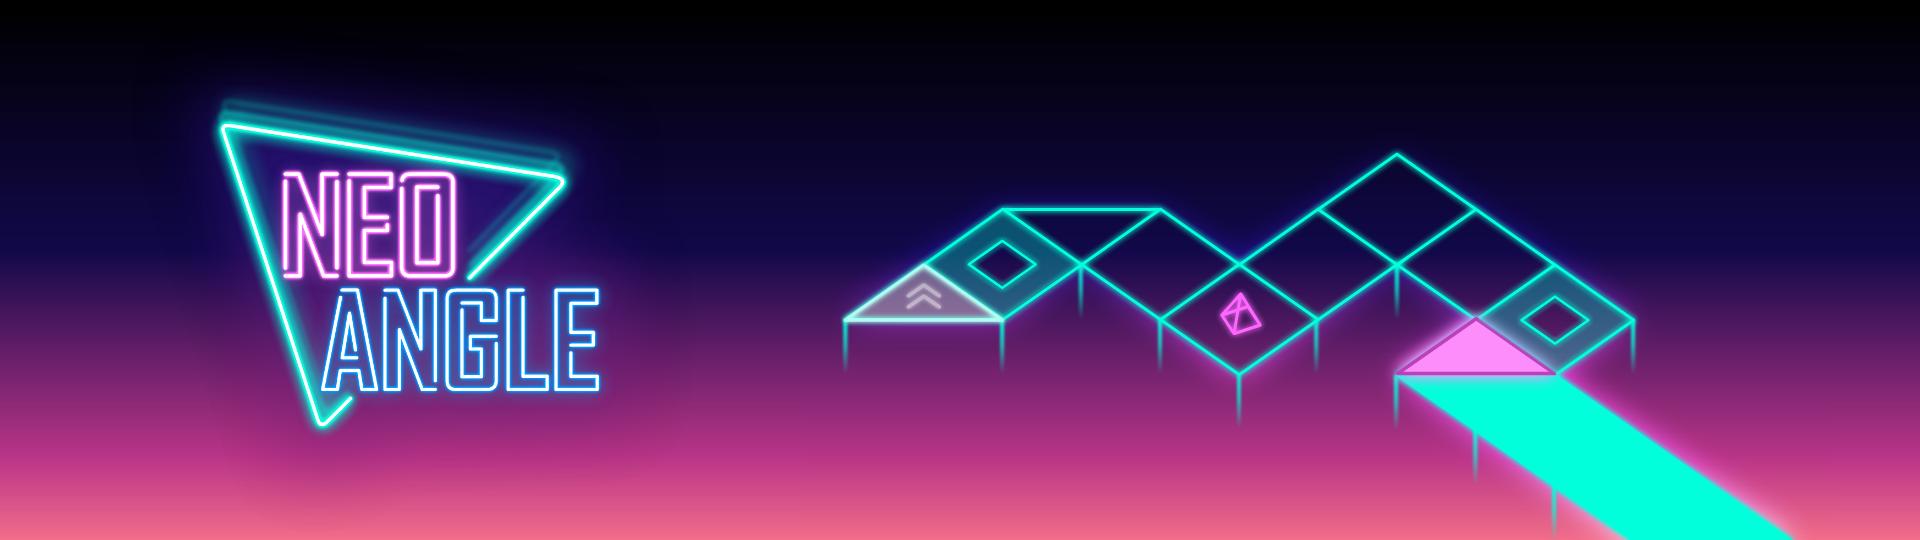 Игра-головоломка Neo Angle. Продолжение истории разработки и релиз в Appstore - 1